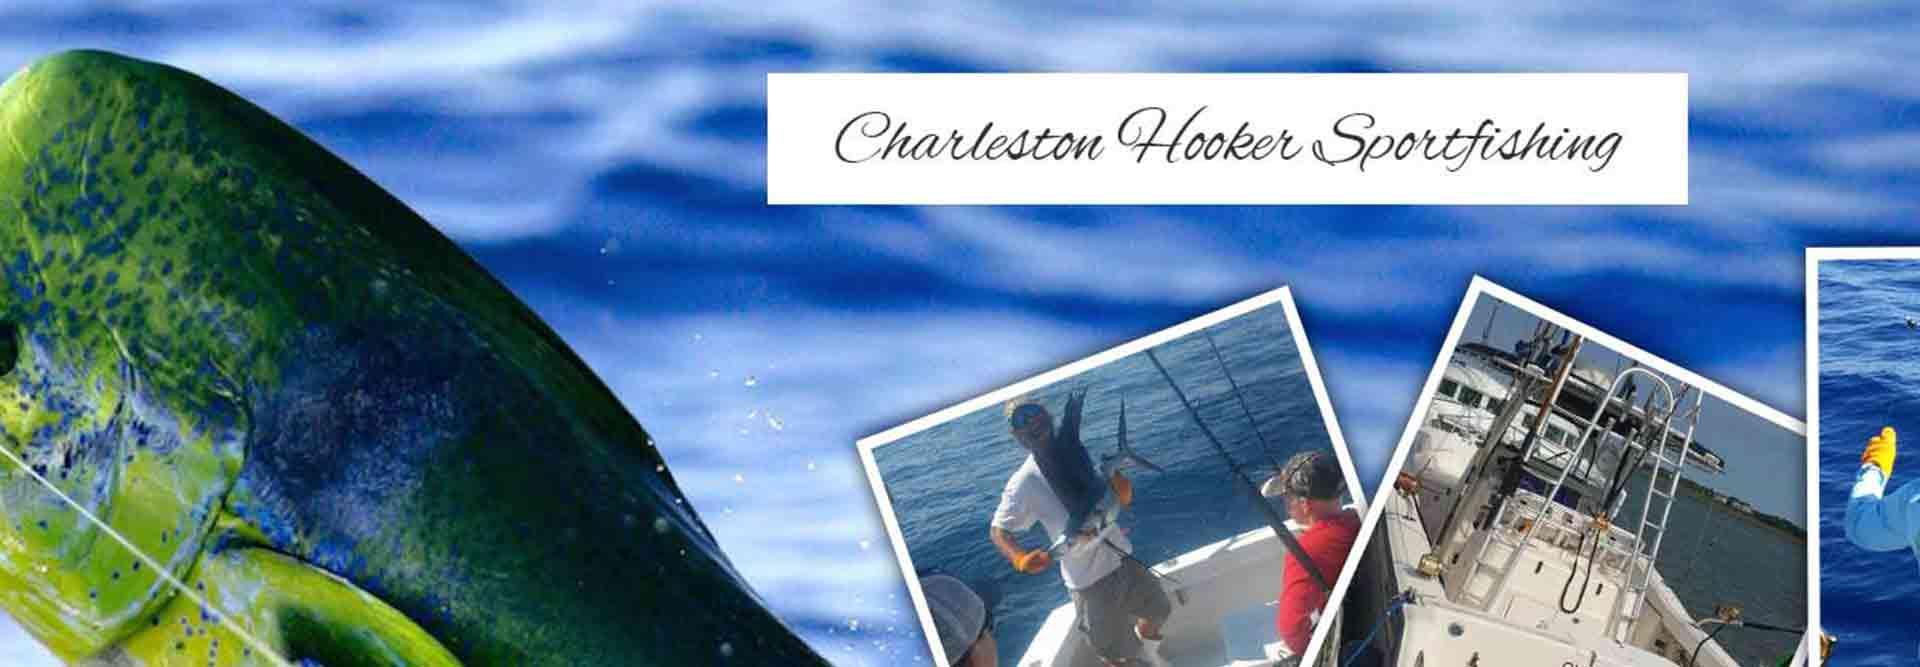 Charleston-hooker-ban